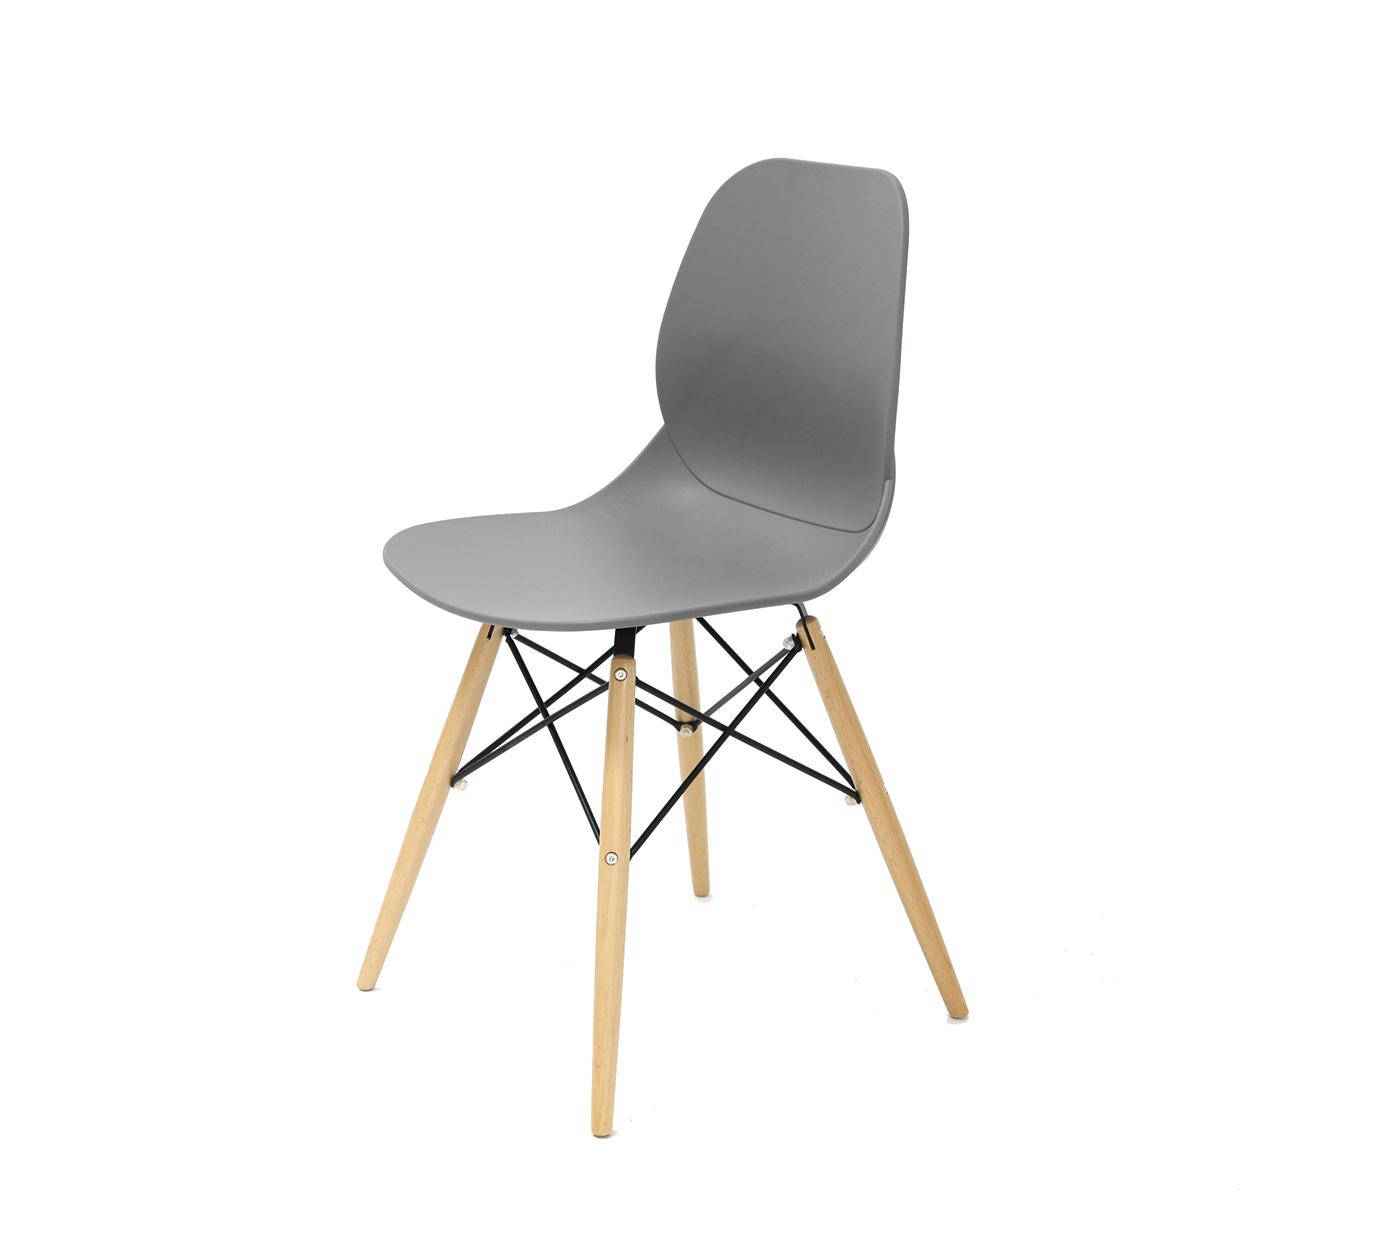 Стул PW-025 серыйОбеденные стулья<br>Материал: Пластик, дерево<br><br>Material: Пластик<br>Ширина см: 45<br>Высота см: 82<br>Глубина см: 49